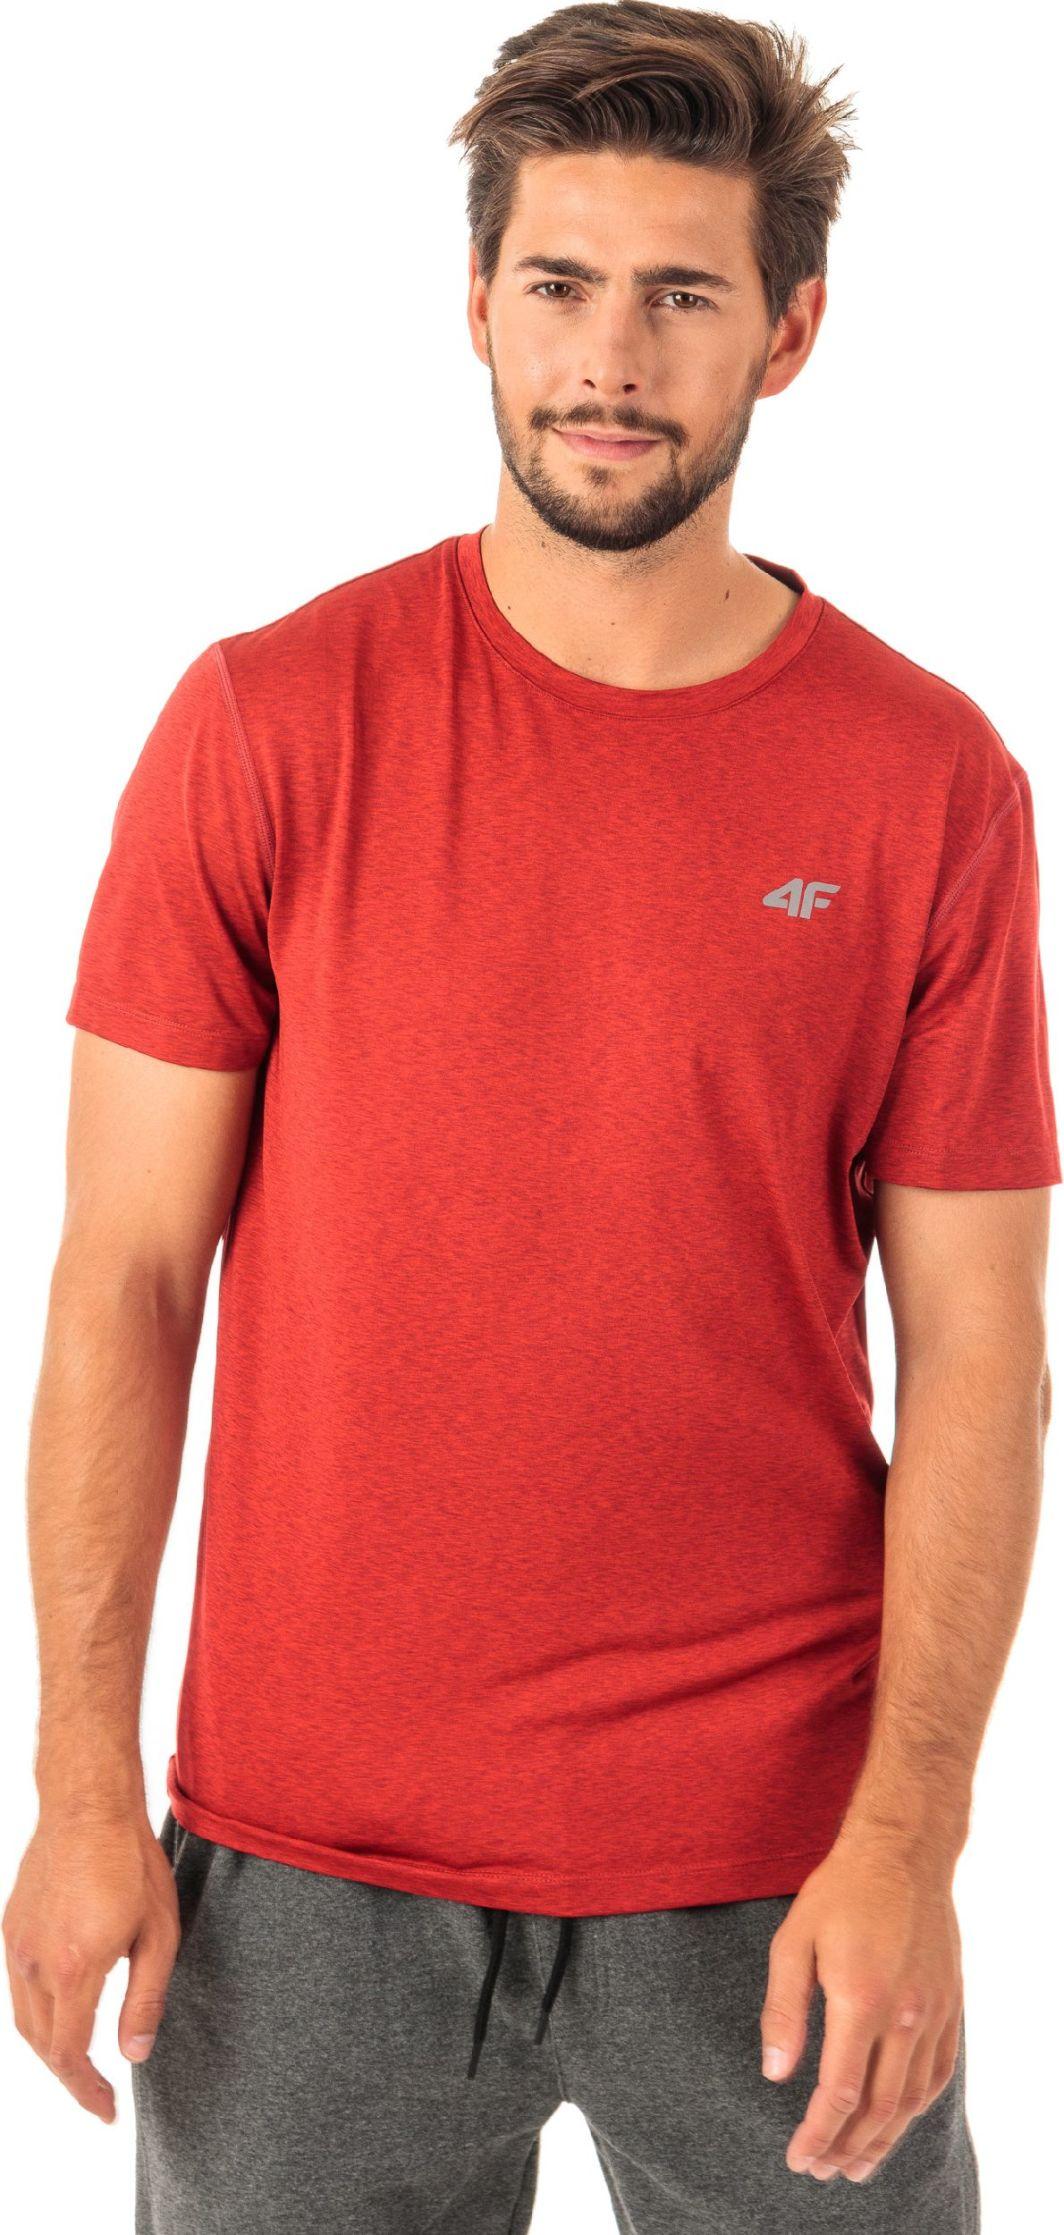 4f Koszulka męska H4Z18-TSMF001 czerwona r. M 1